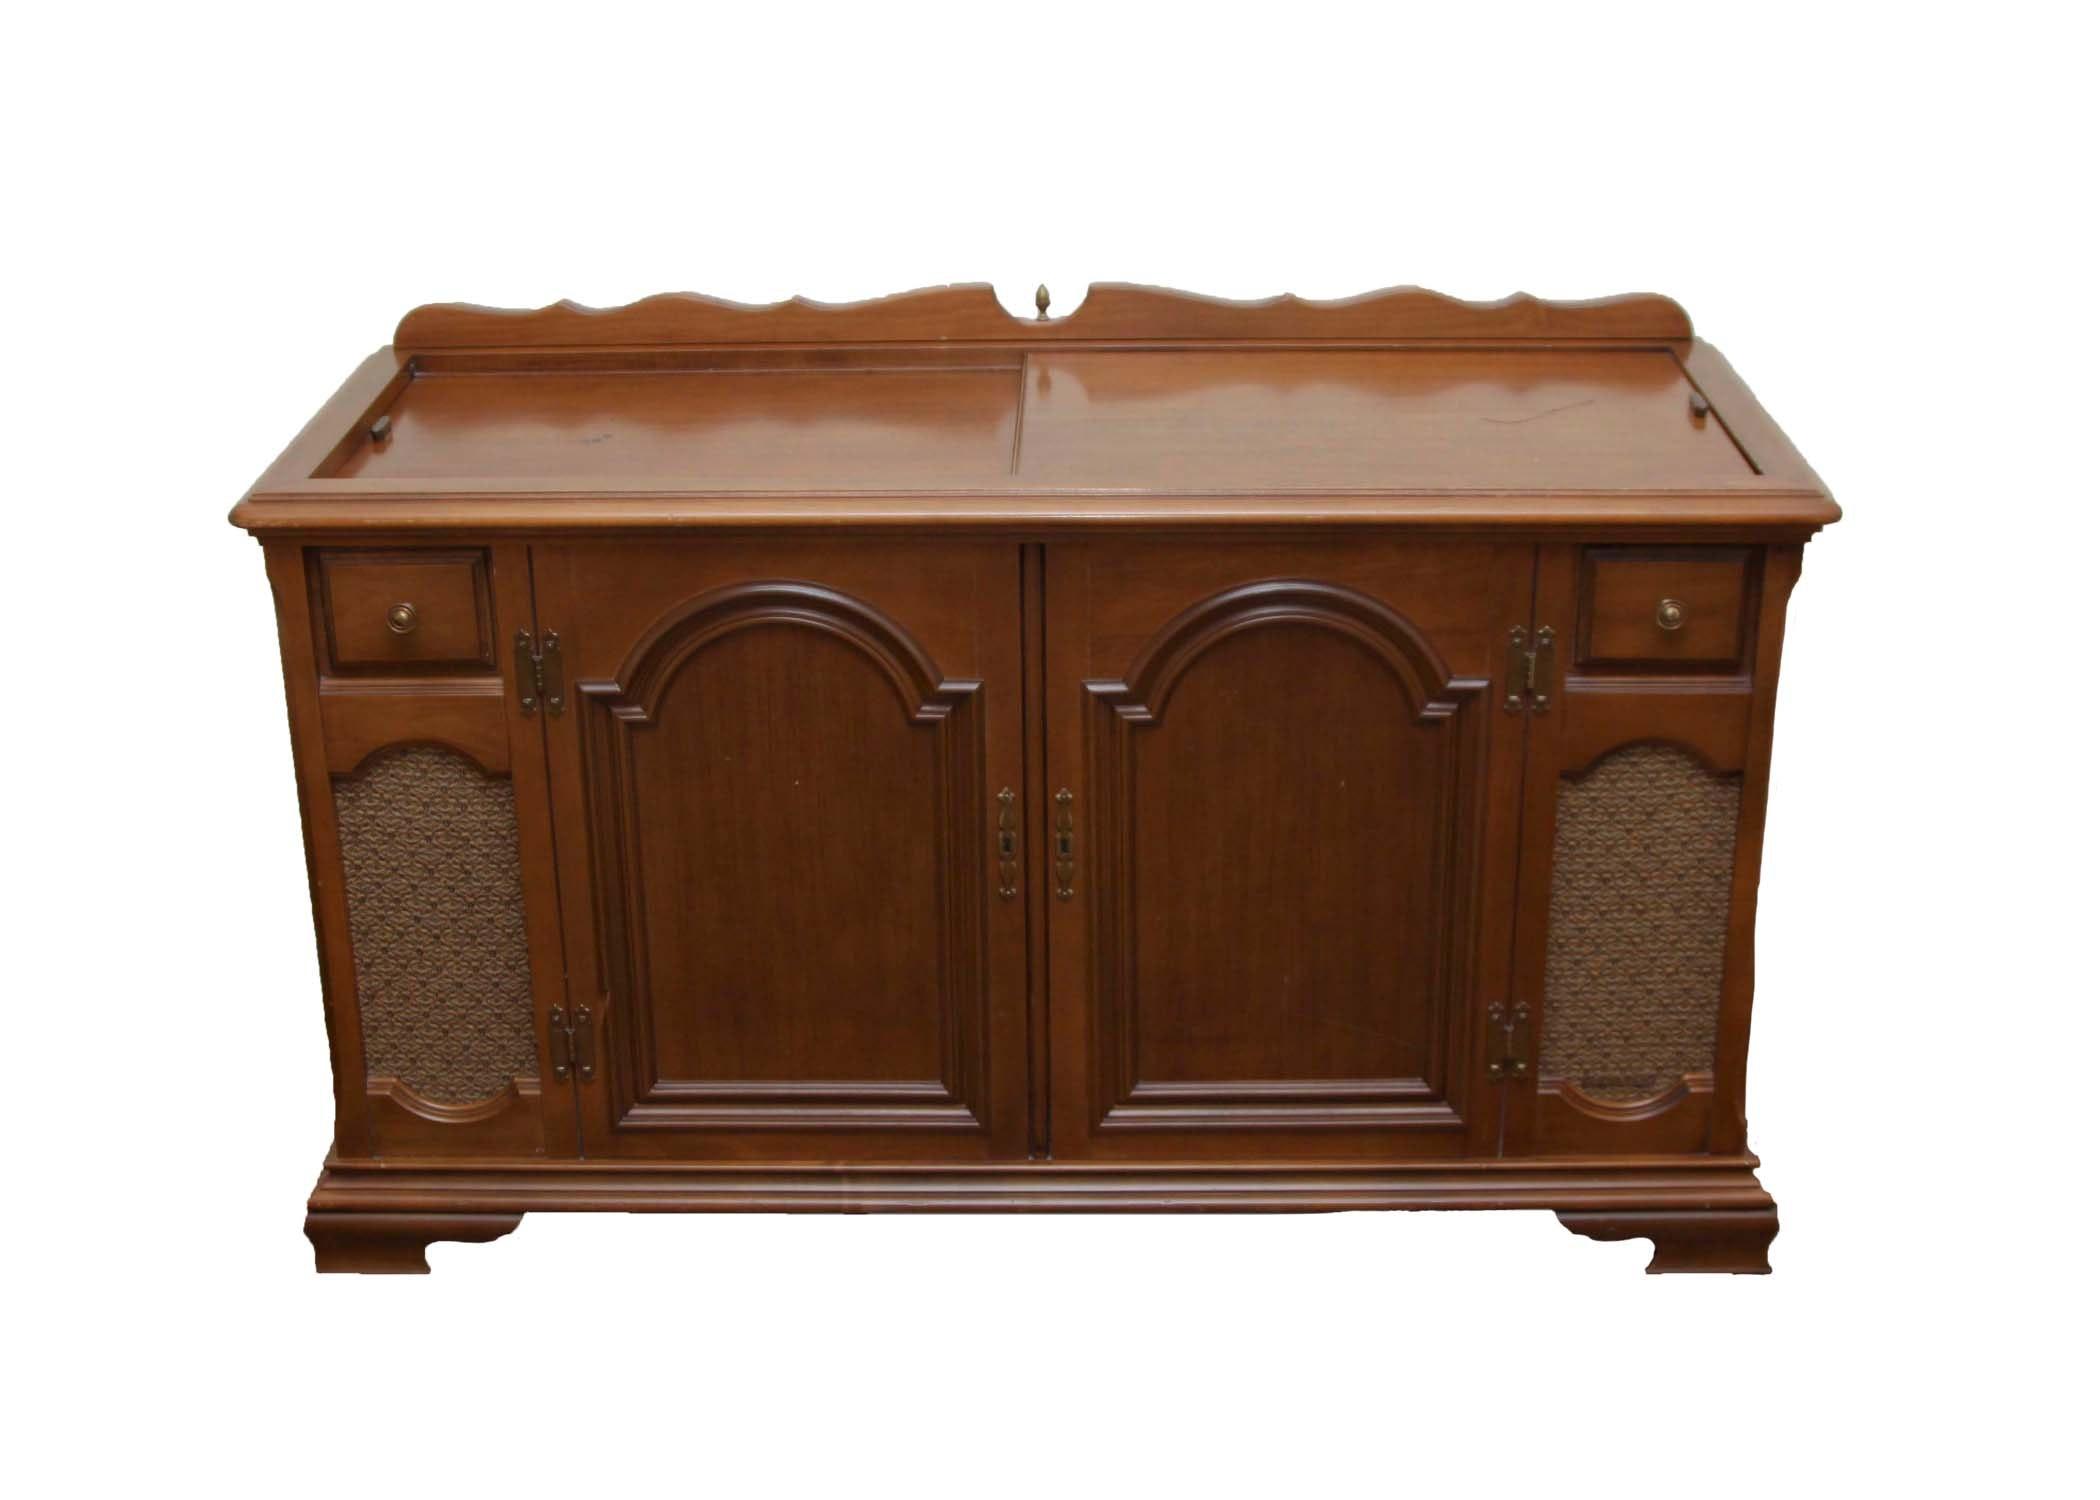 Magnavox Vintage Stereo Cabinet